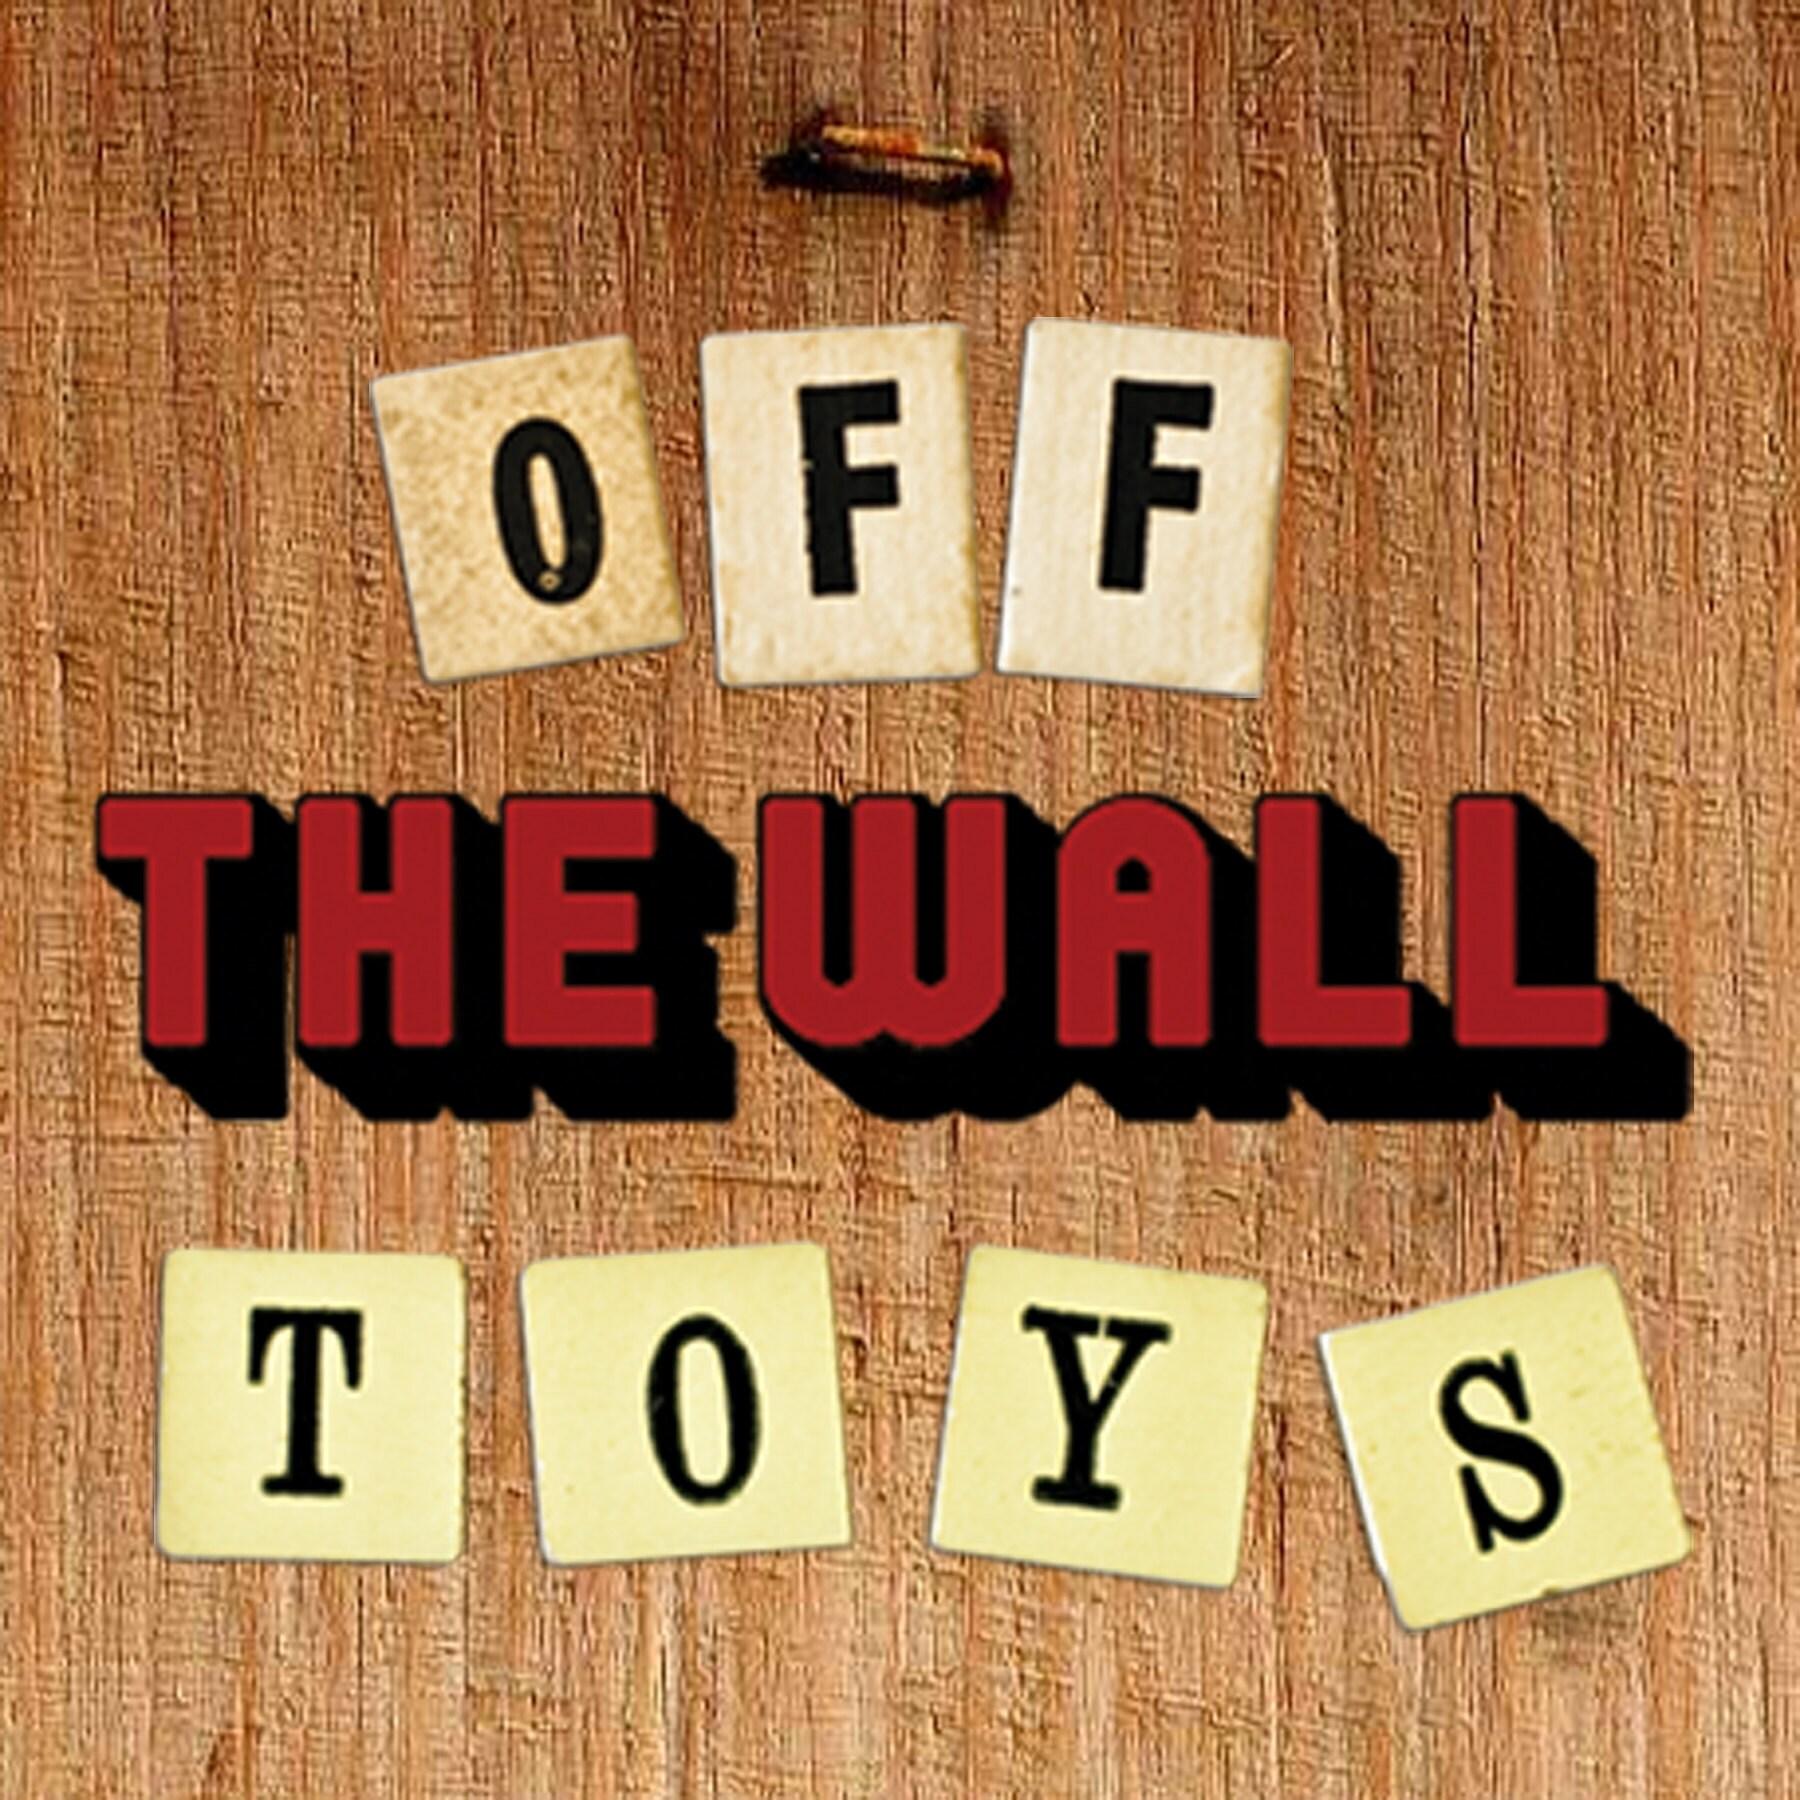 OfftheWallToys